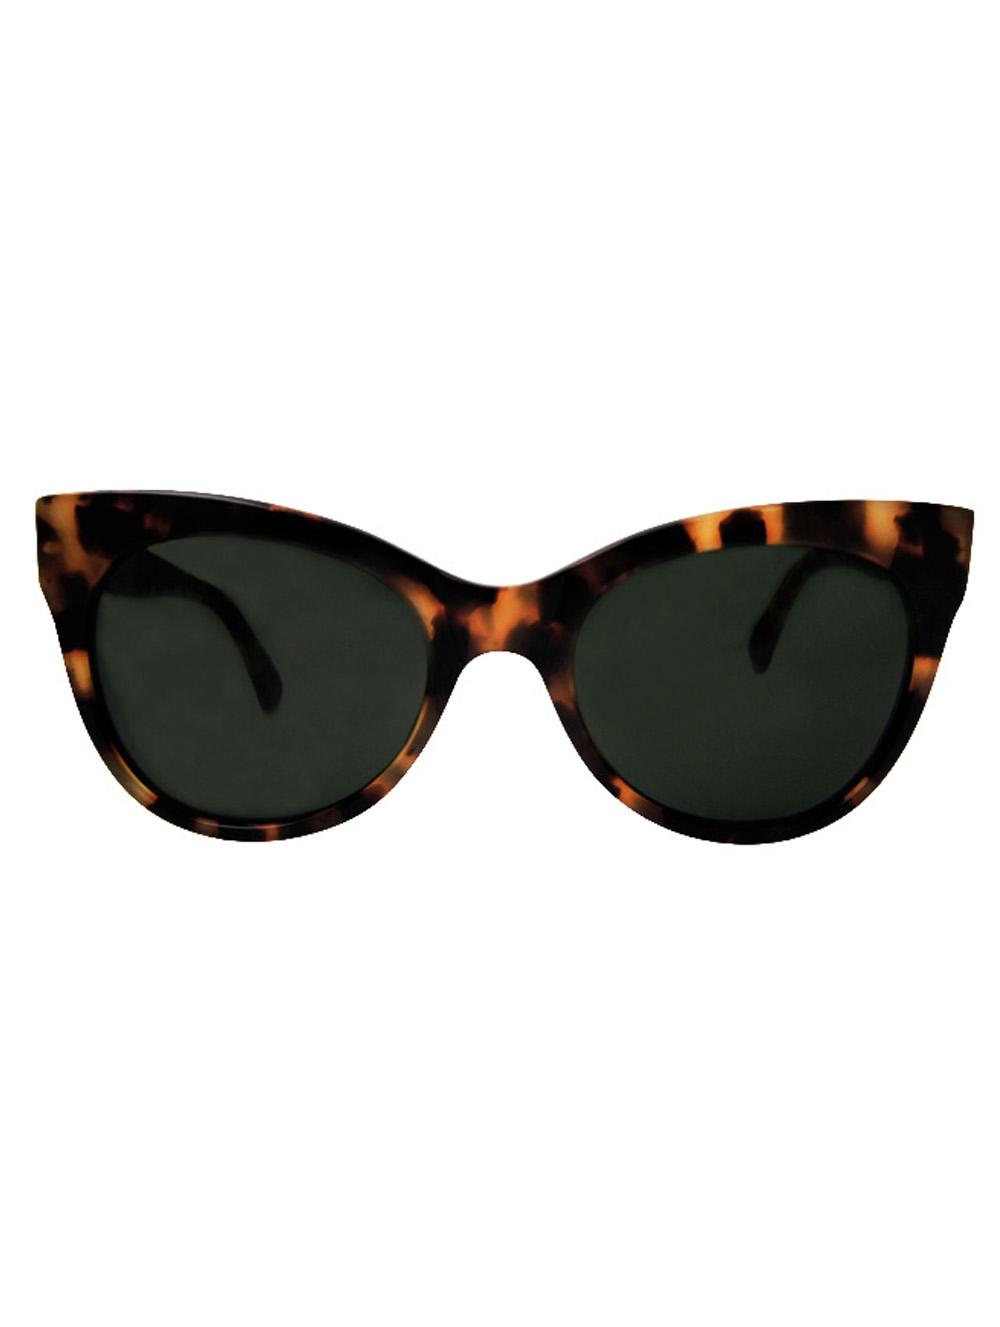 Tokyo Tort Square Cat Eye Sunglasses